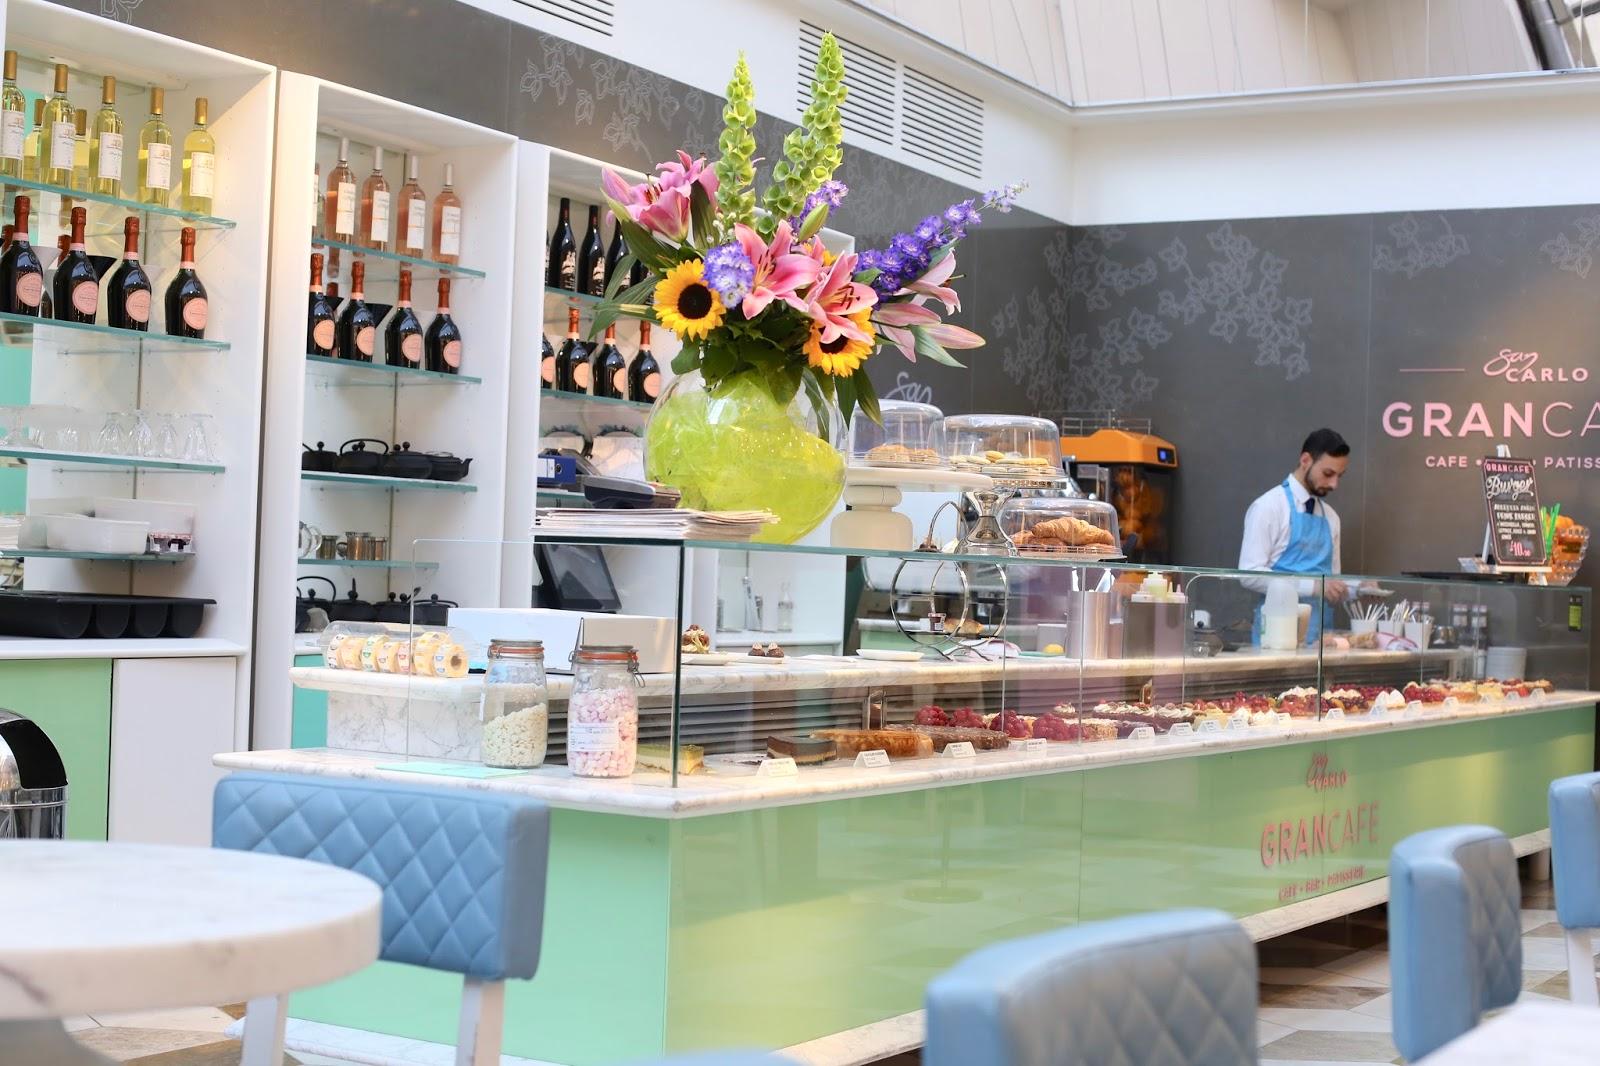 Selfridges Gran Cafe